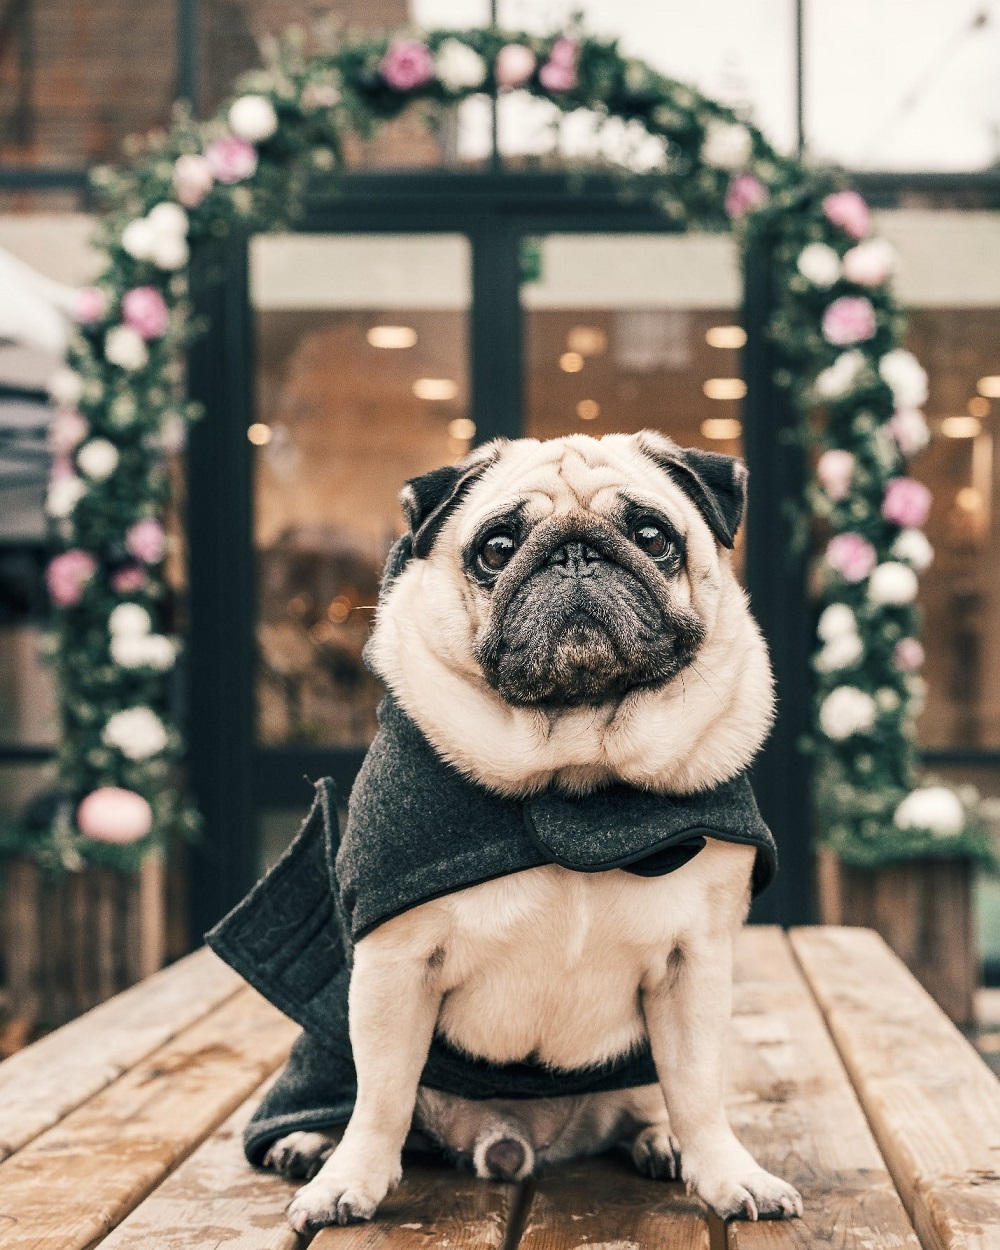 kuoser dog winter jackets